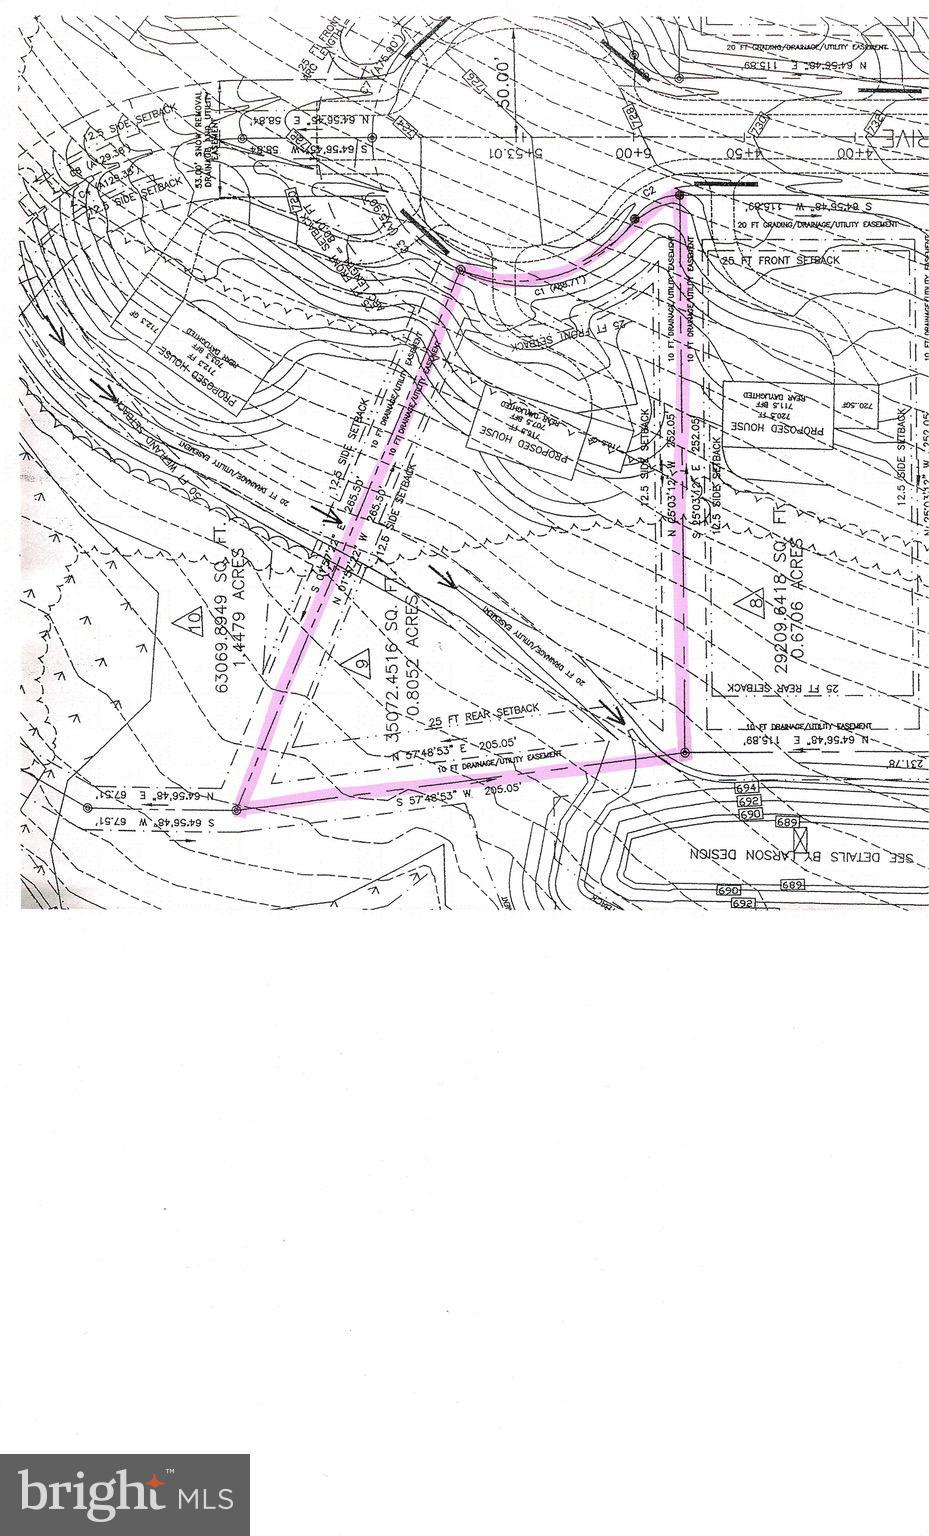 0 S GREEN HILLS DR, FRIEDENSBURG, PA 17933